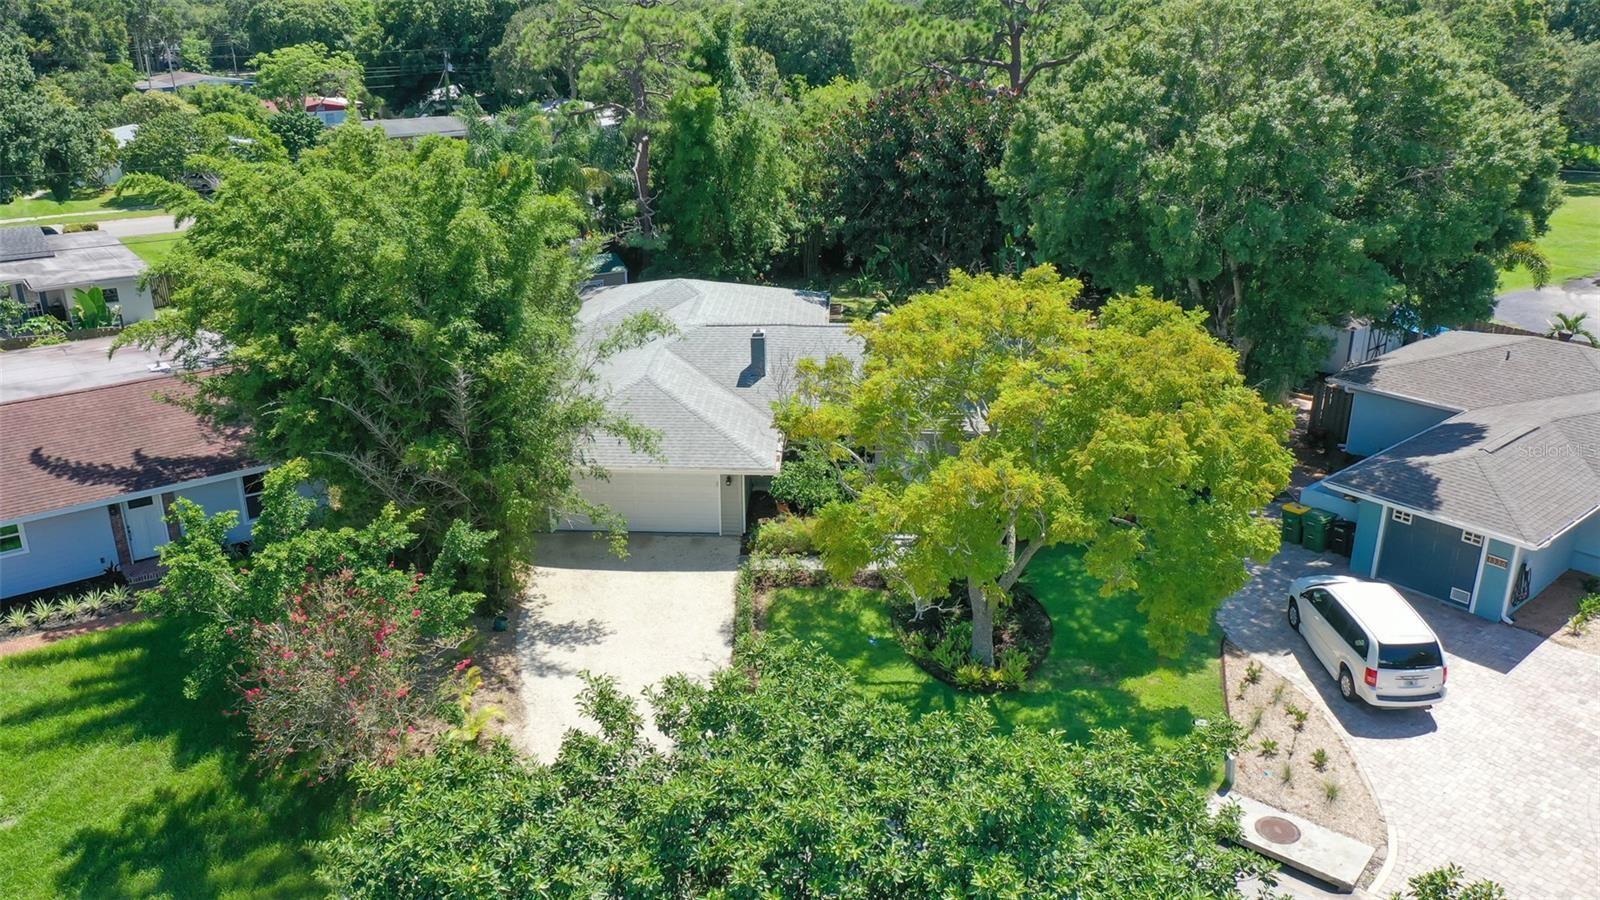 Photo of 1346 LOMA LINDA COURT, SARASOTA, FL 34239 (MLS # A4509099)